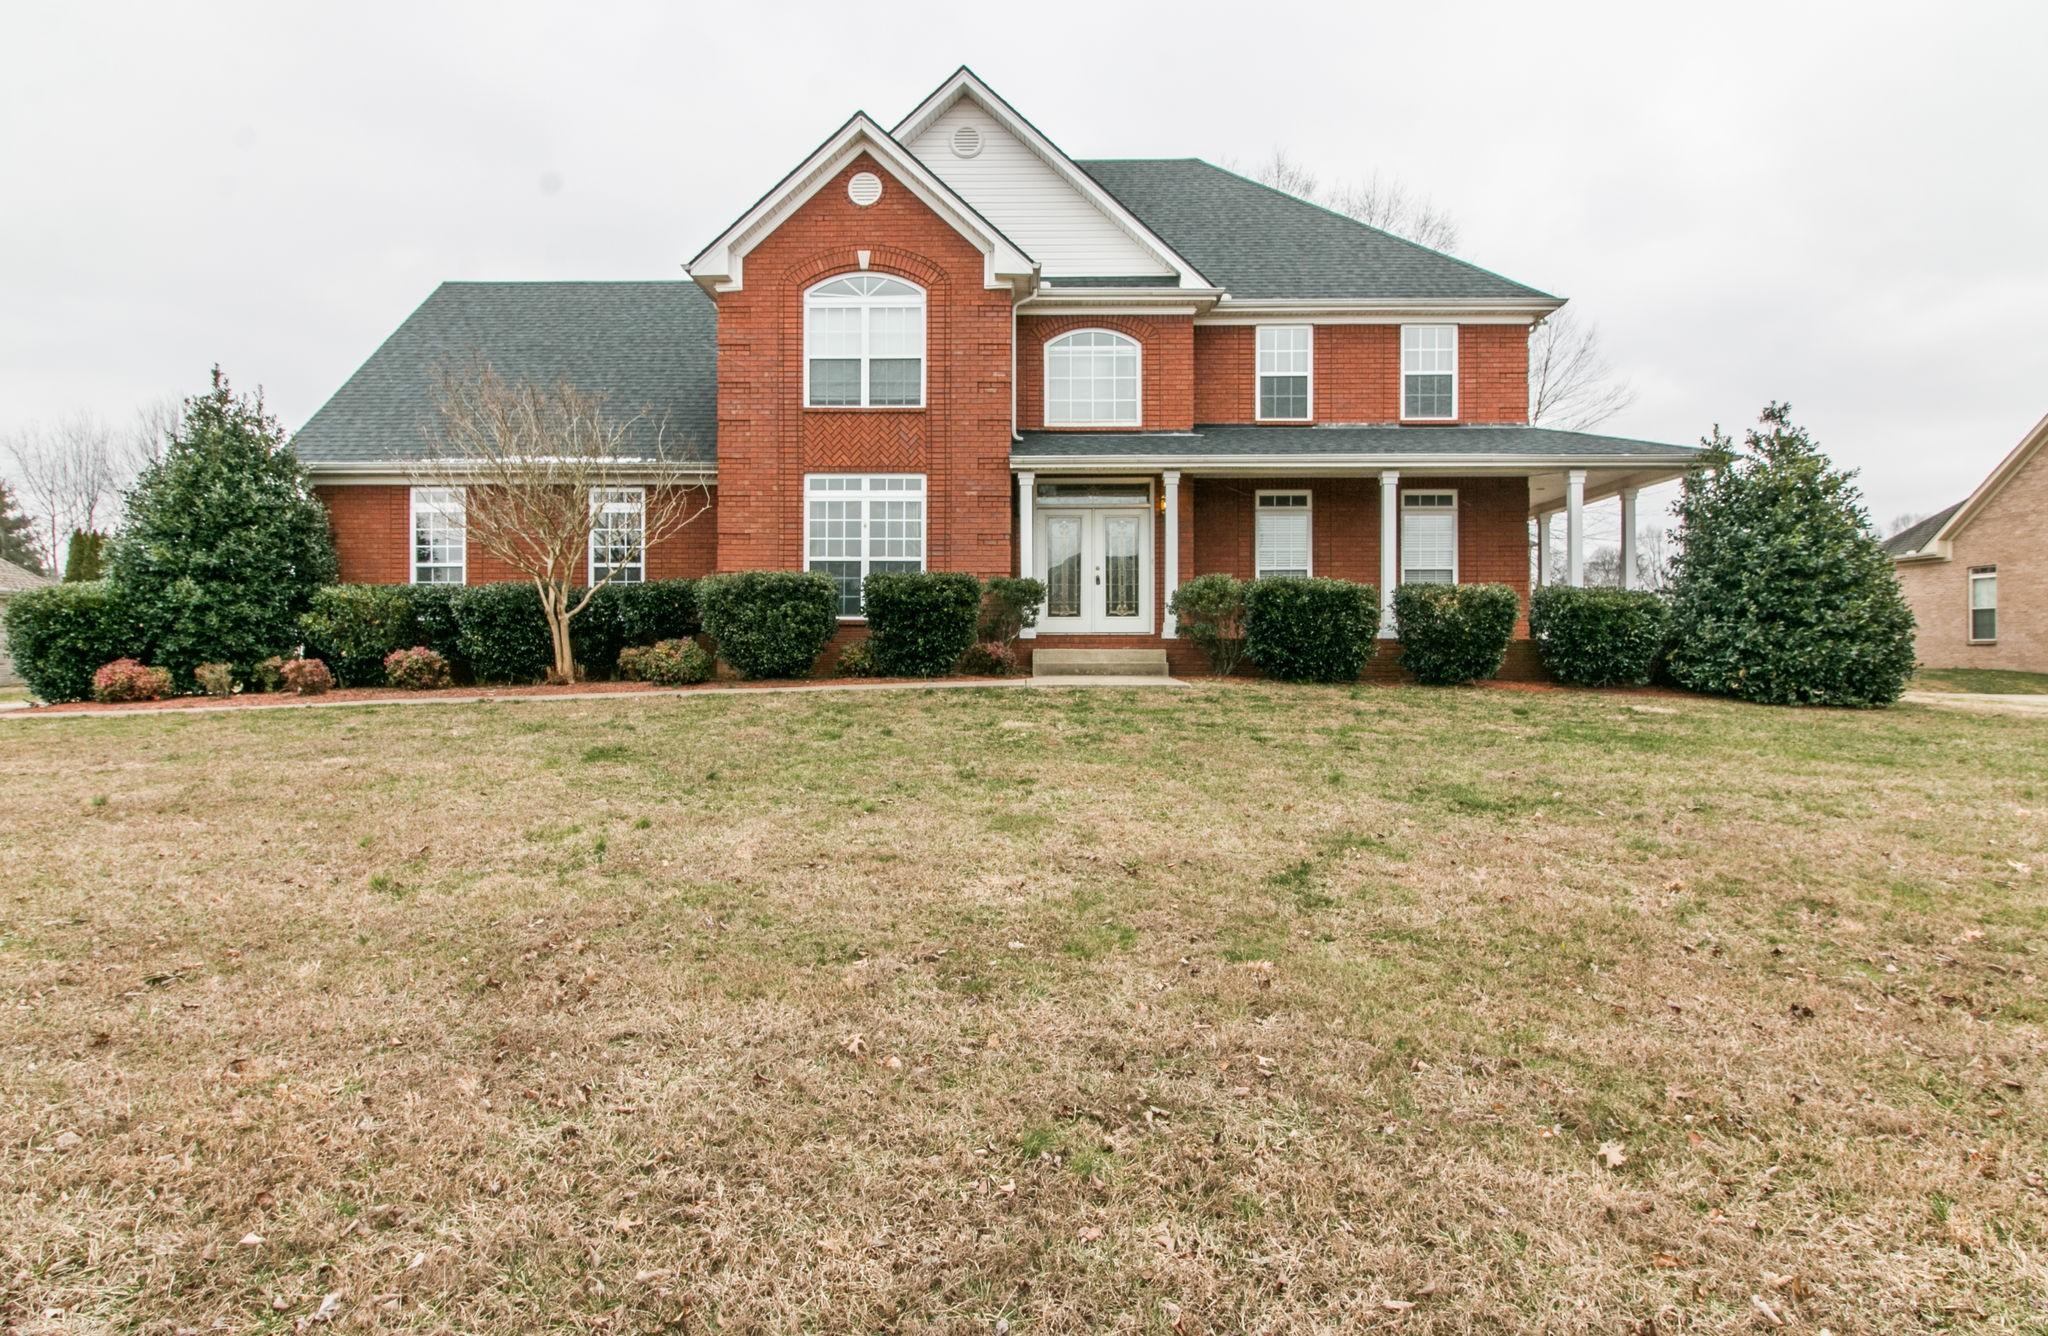 1059 Kacie Dr, Pleasant View, TN 37146 - Pleasant View, TN real estate listing